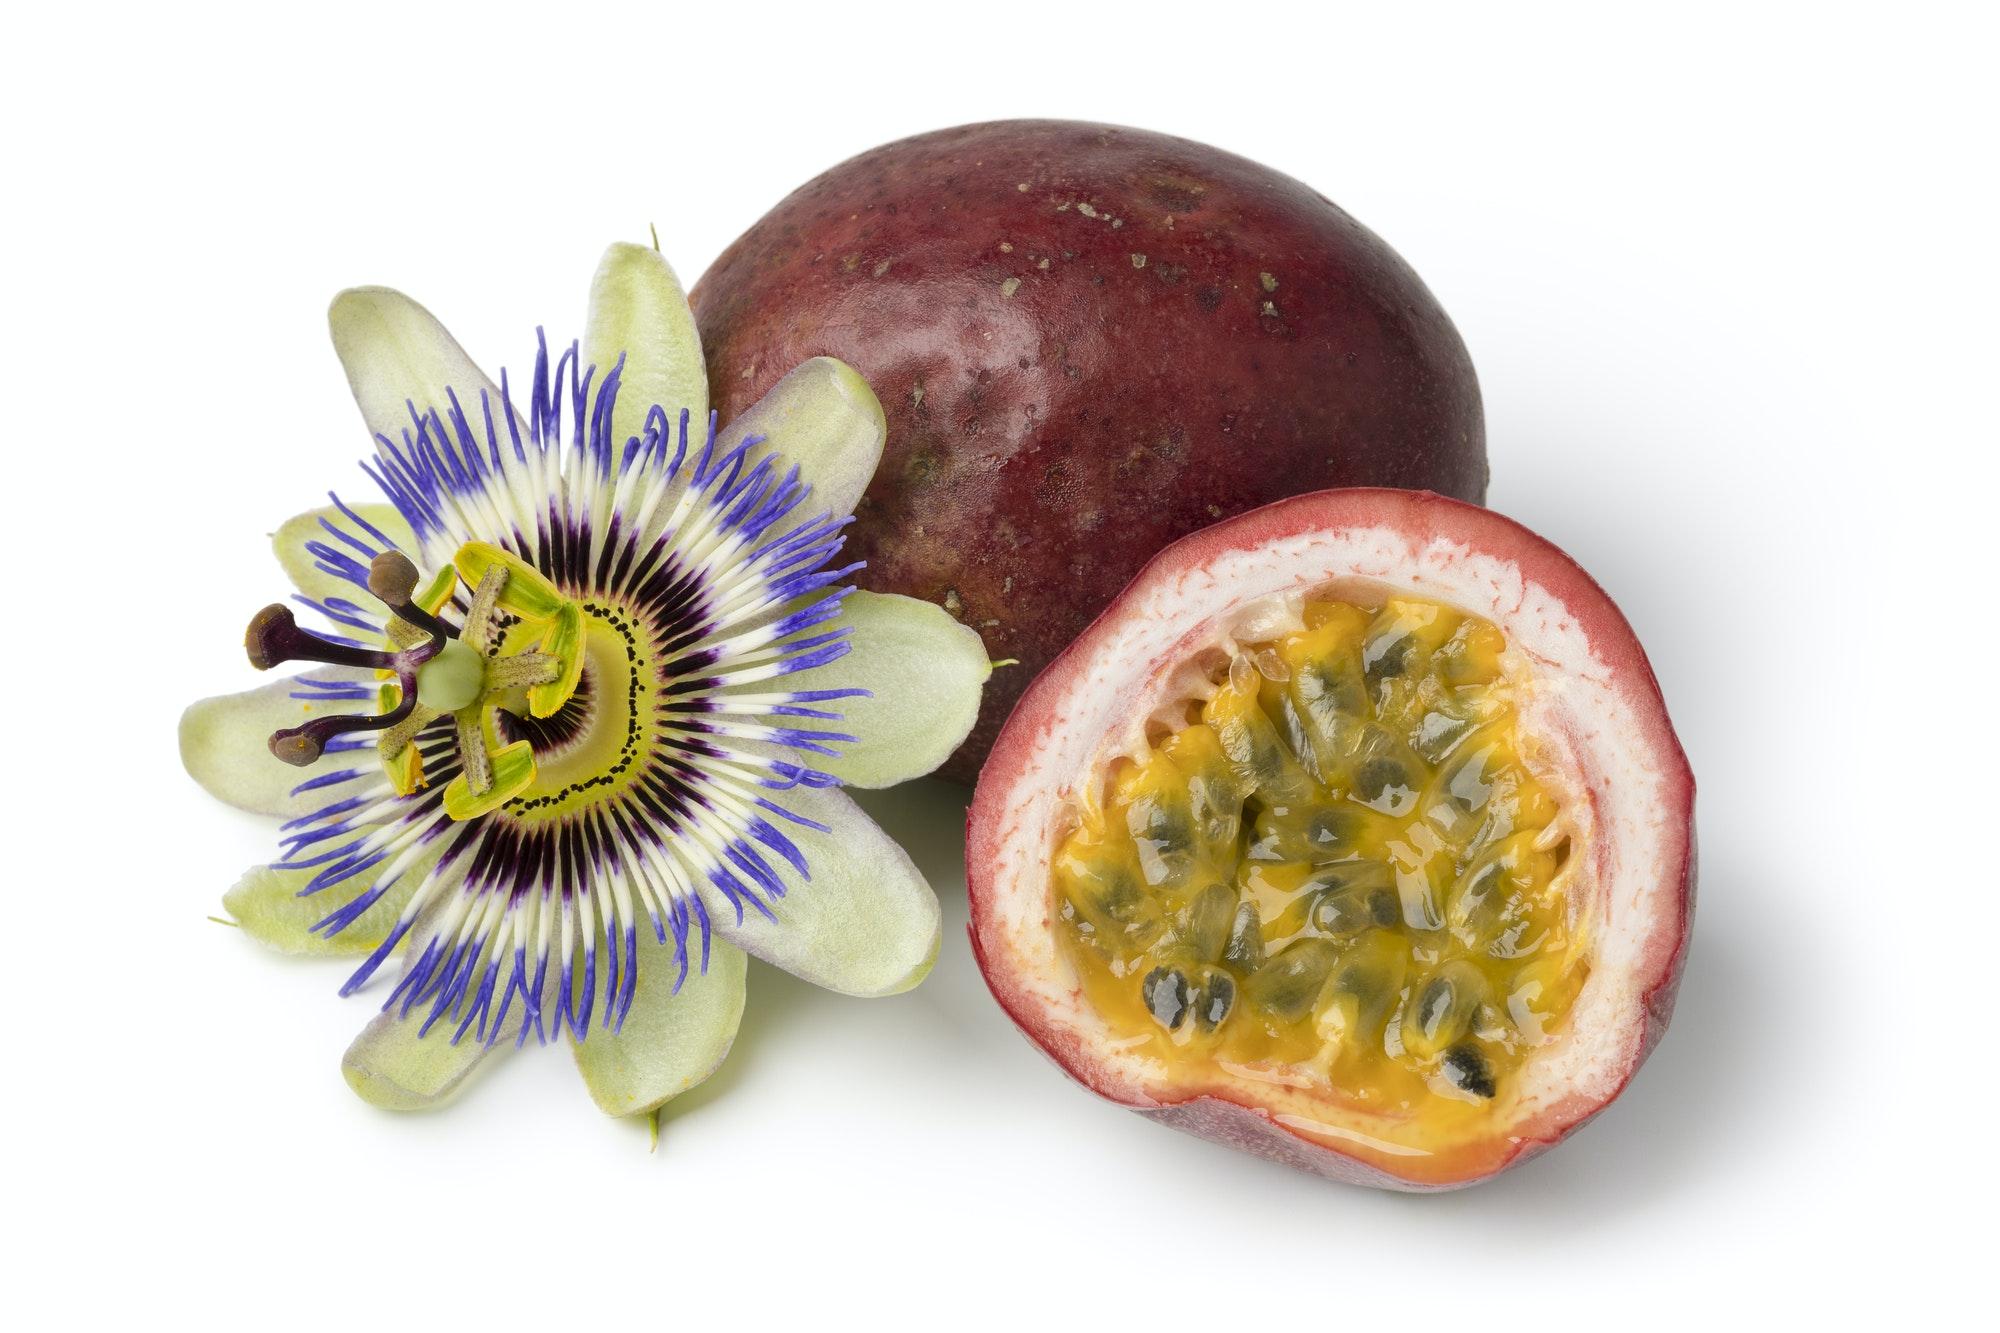 Passiflora edulis fruit and flower